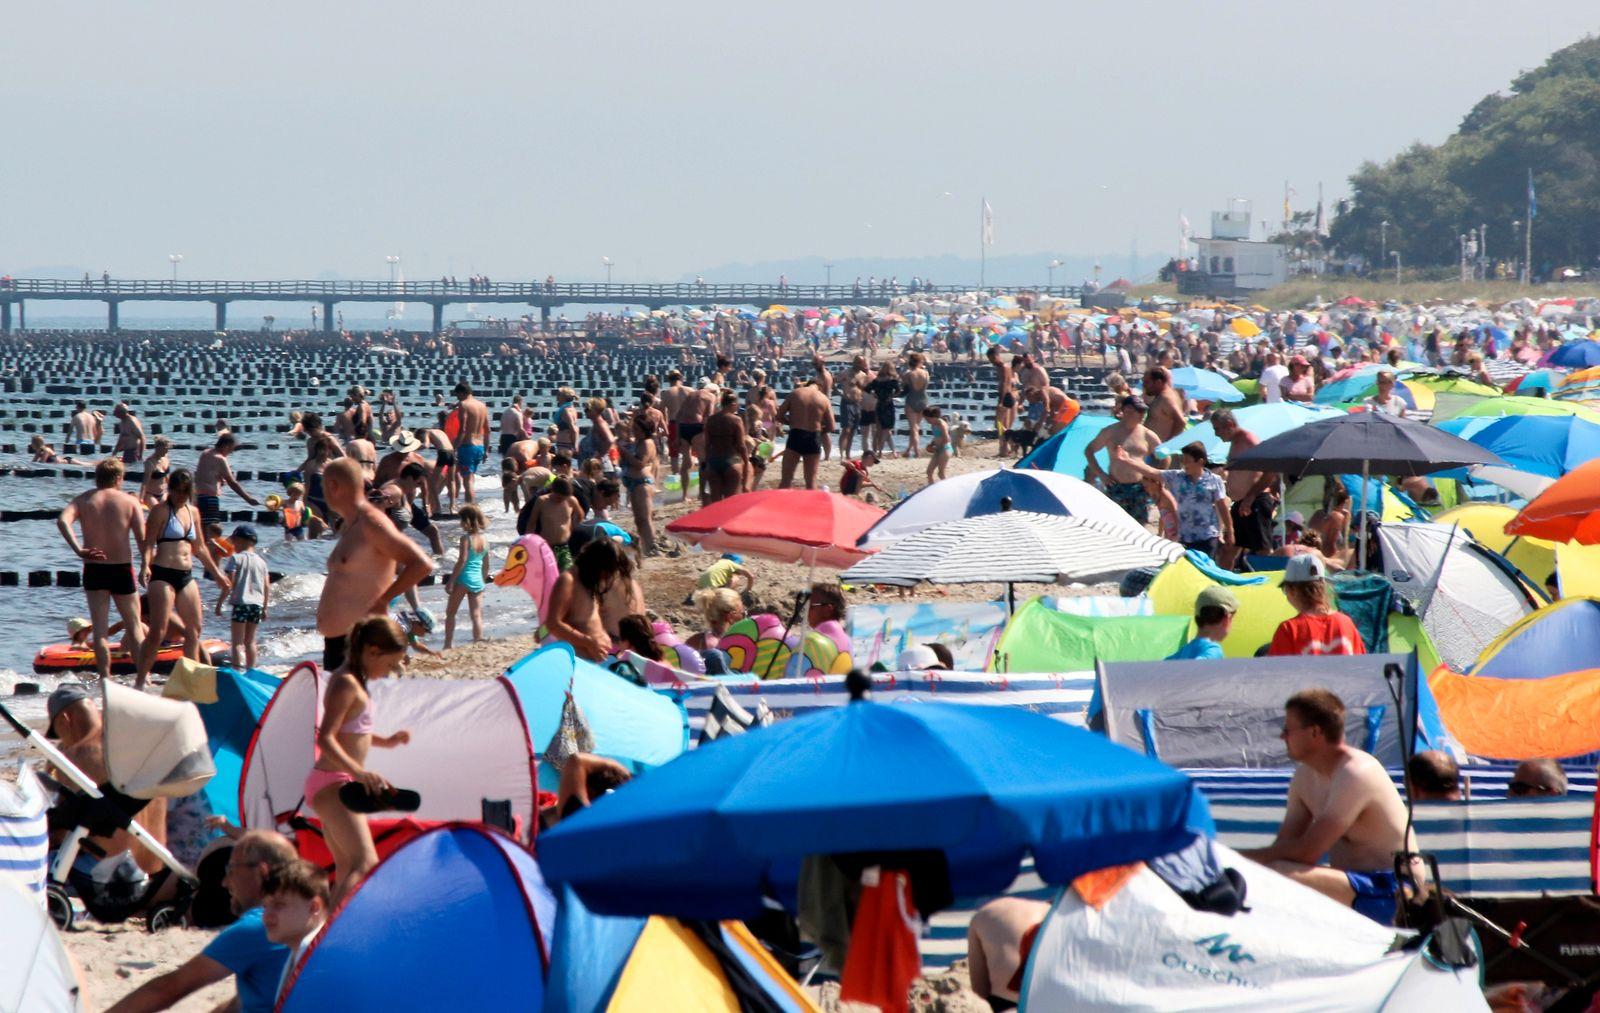 Ostsee Strand Kuehlungsborn Sommer 2020